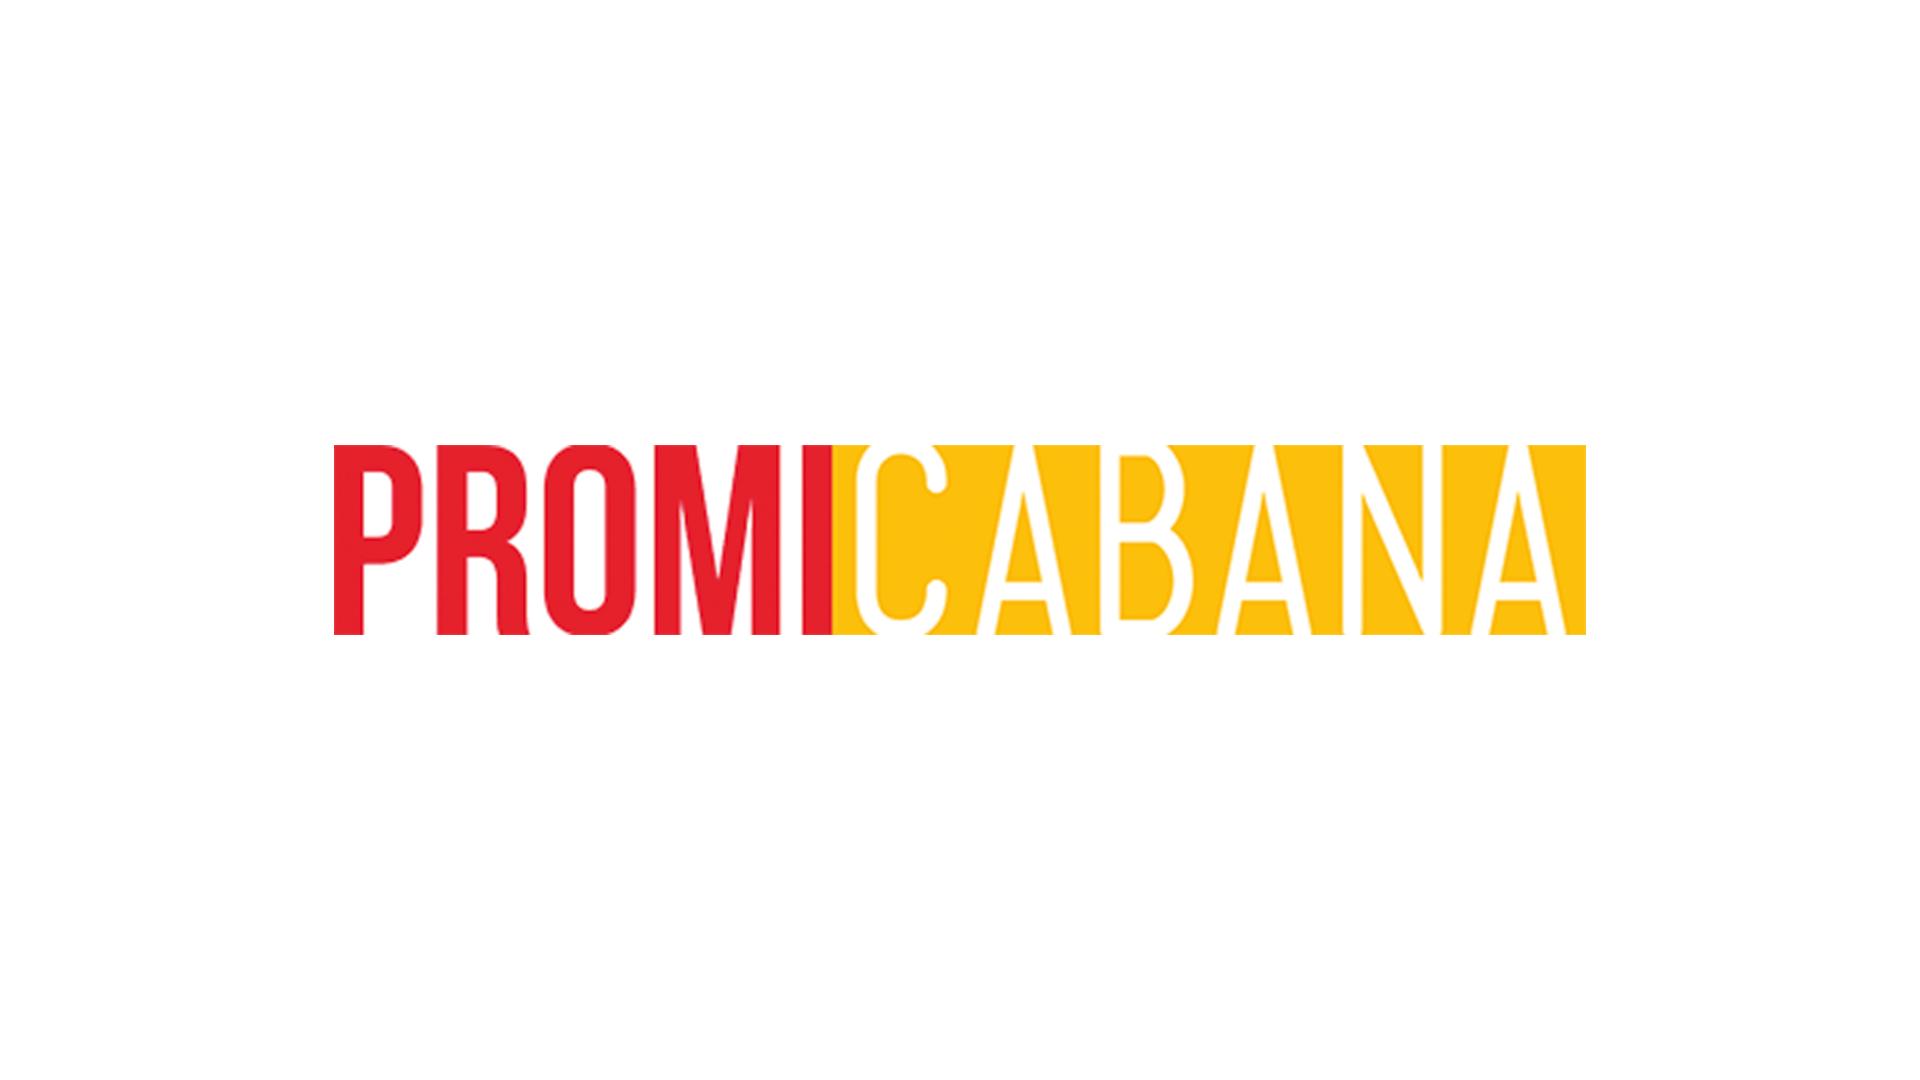 Michelle-Obama-Jimmy-Fallon-Fans